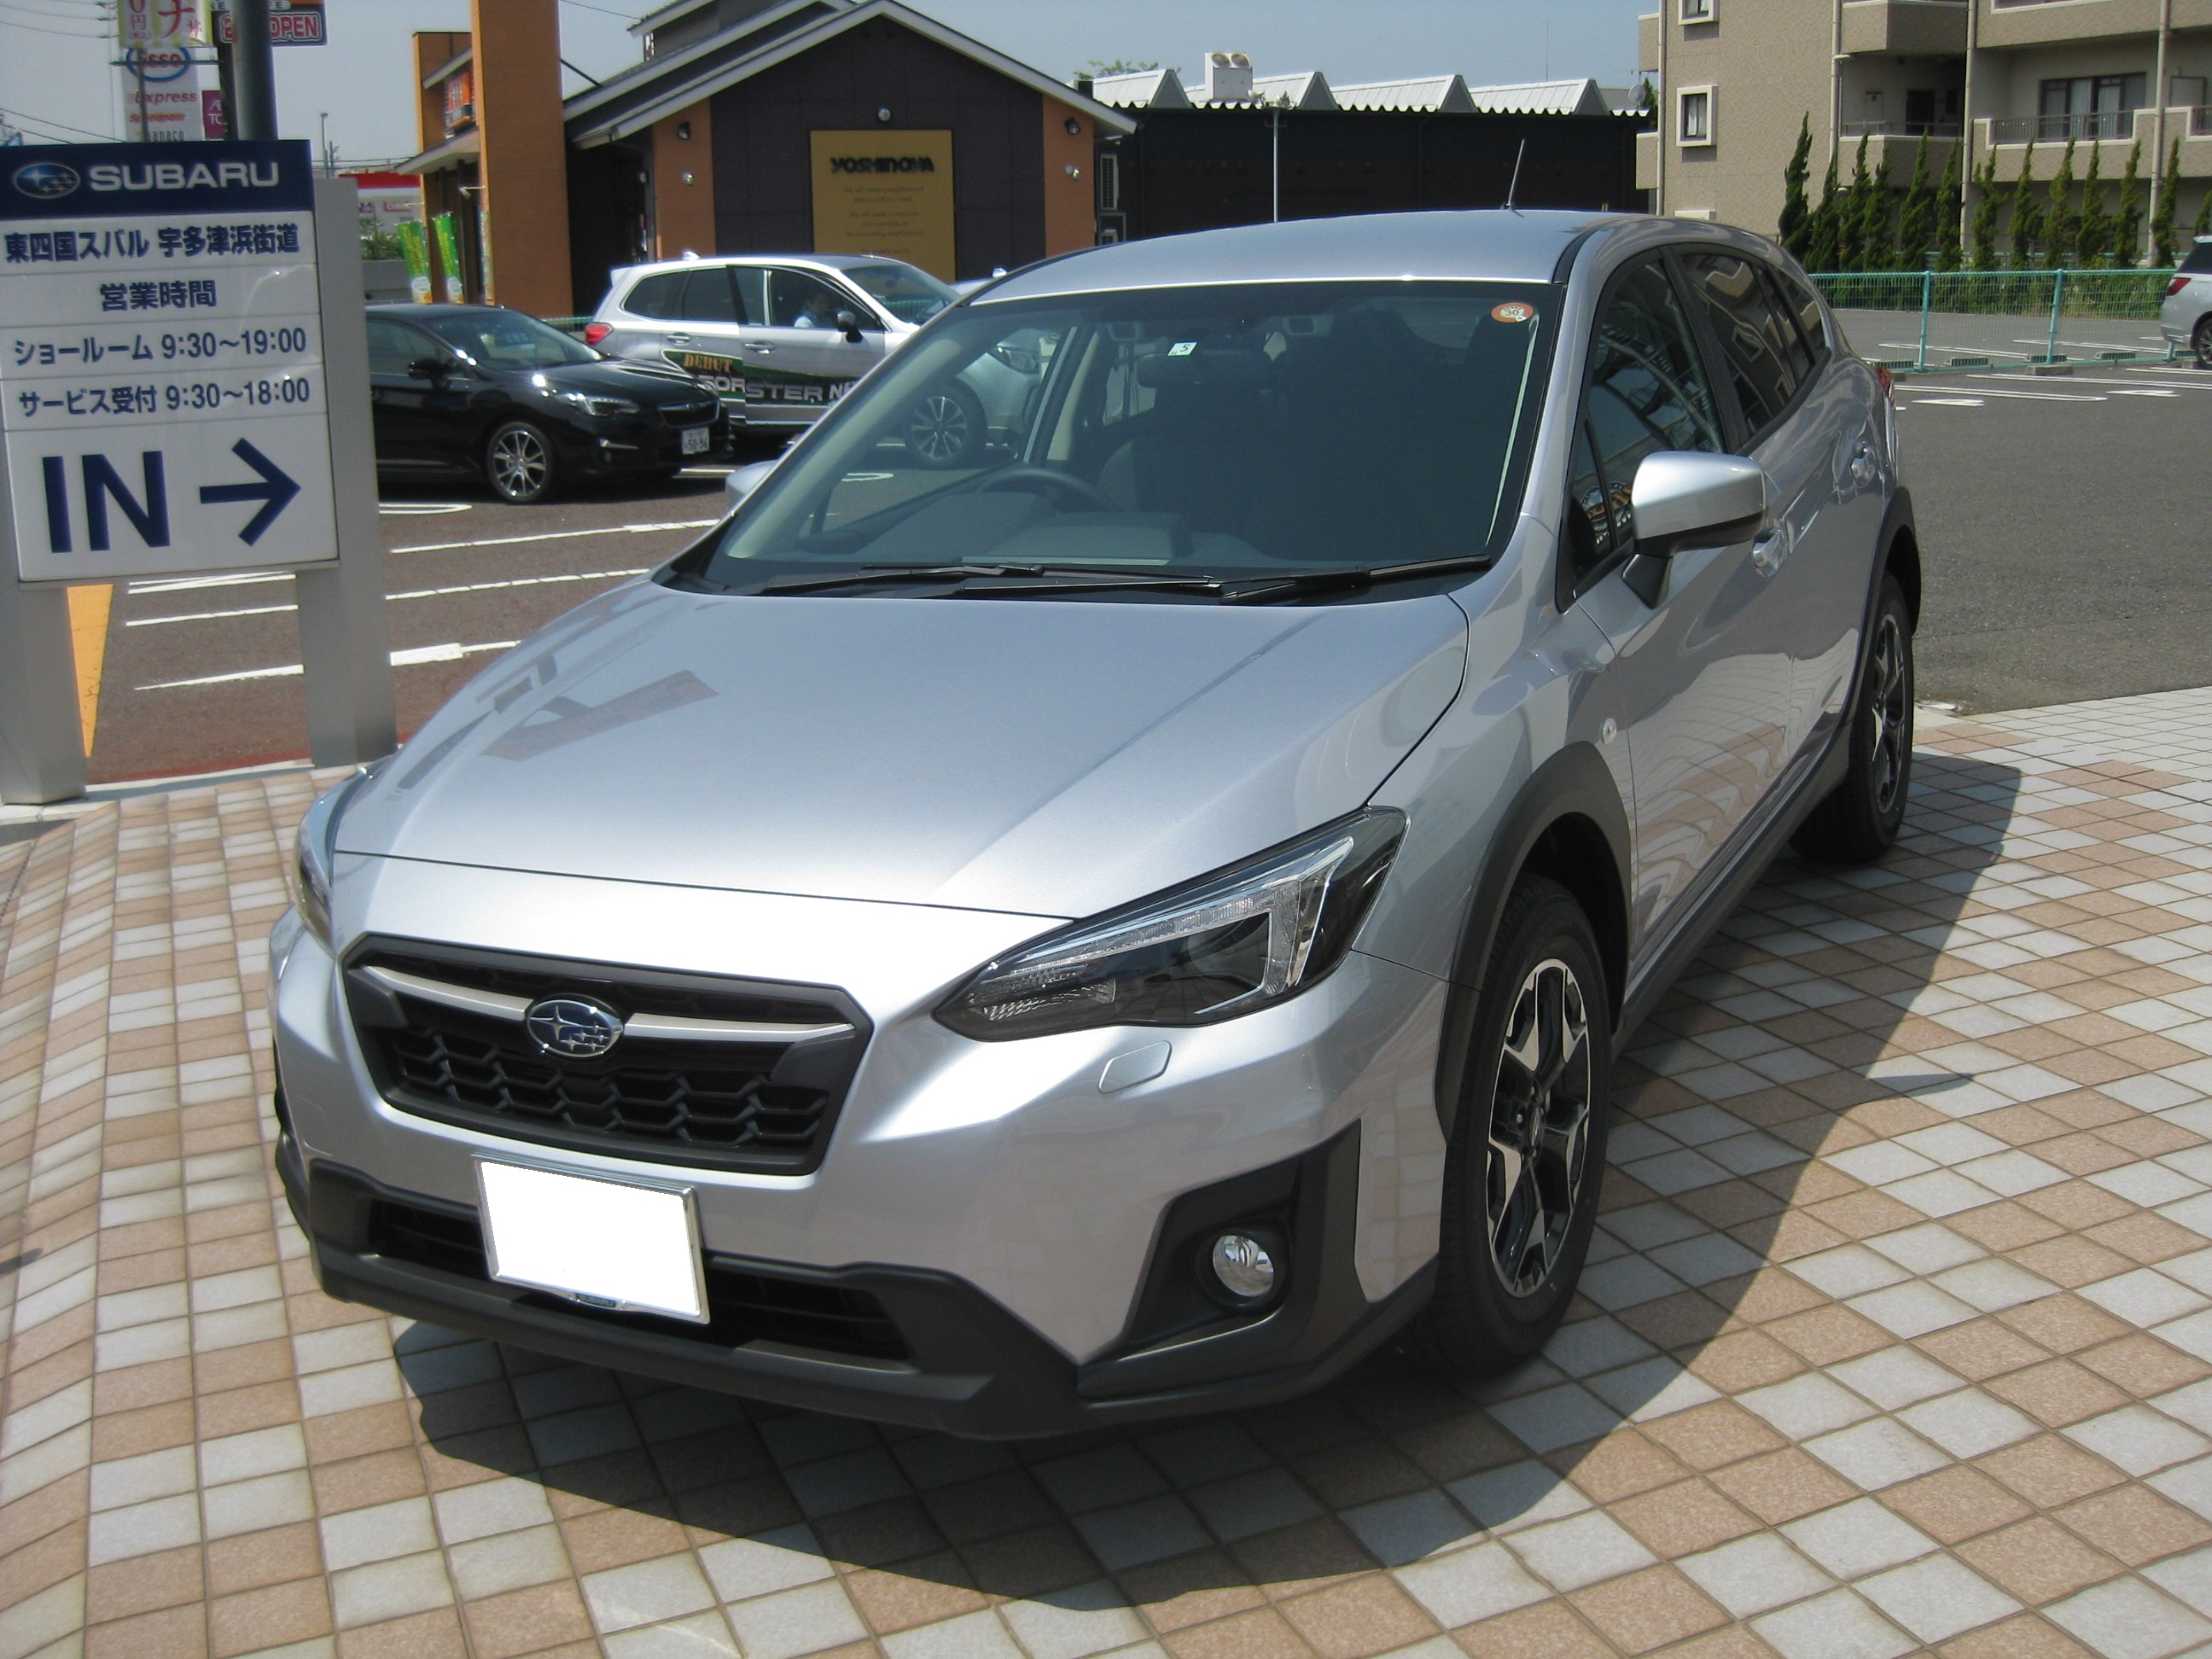 Subaru Xv 2 0i L Subaru Xv 2 0i L 2017 Review Carsguide